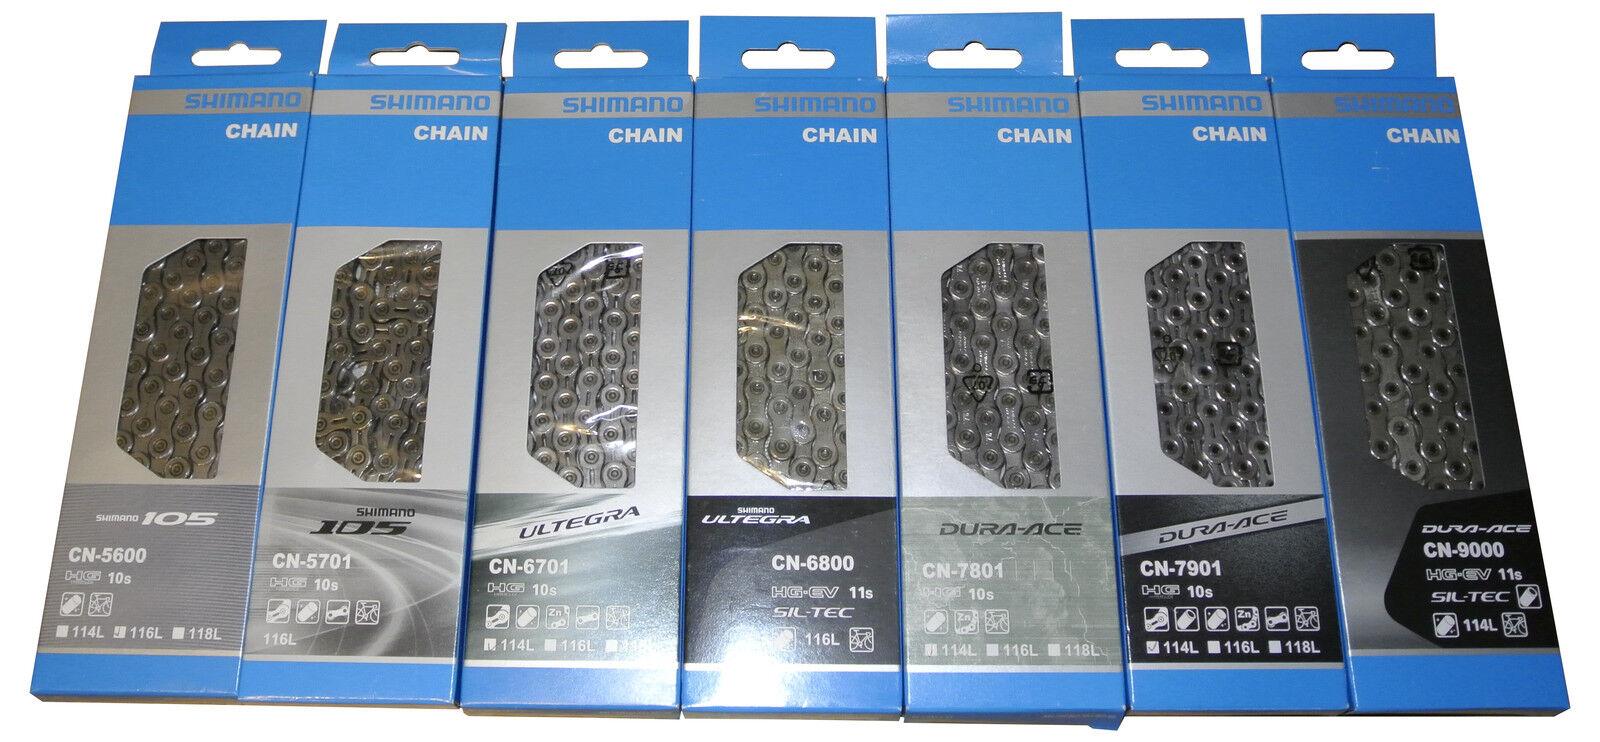 Shimano Kette 5600, 5701, 6701, 6800, 7801, 7901, 9000 (105, Ultegra, Dura Ace)